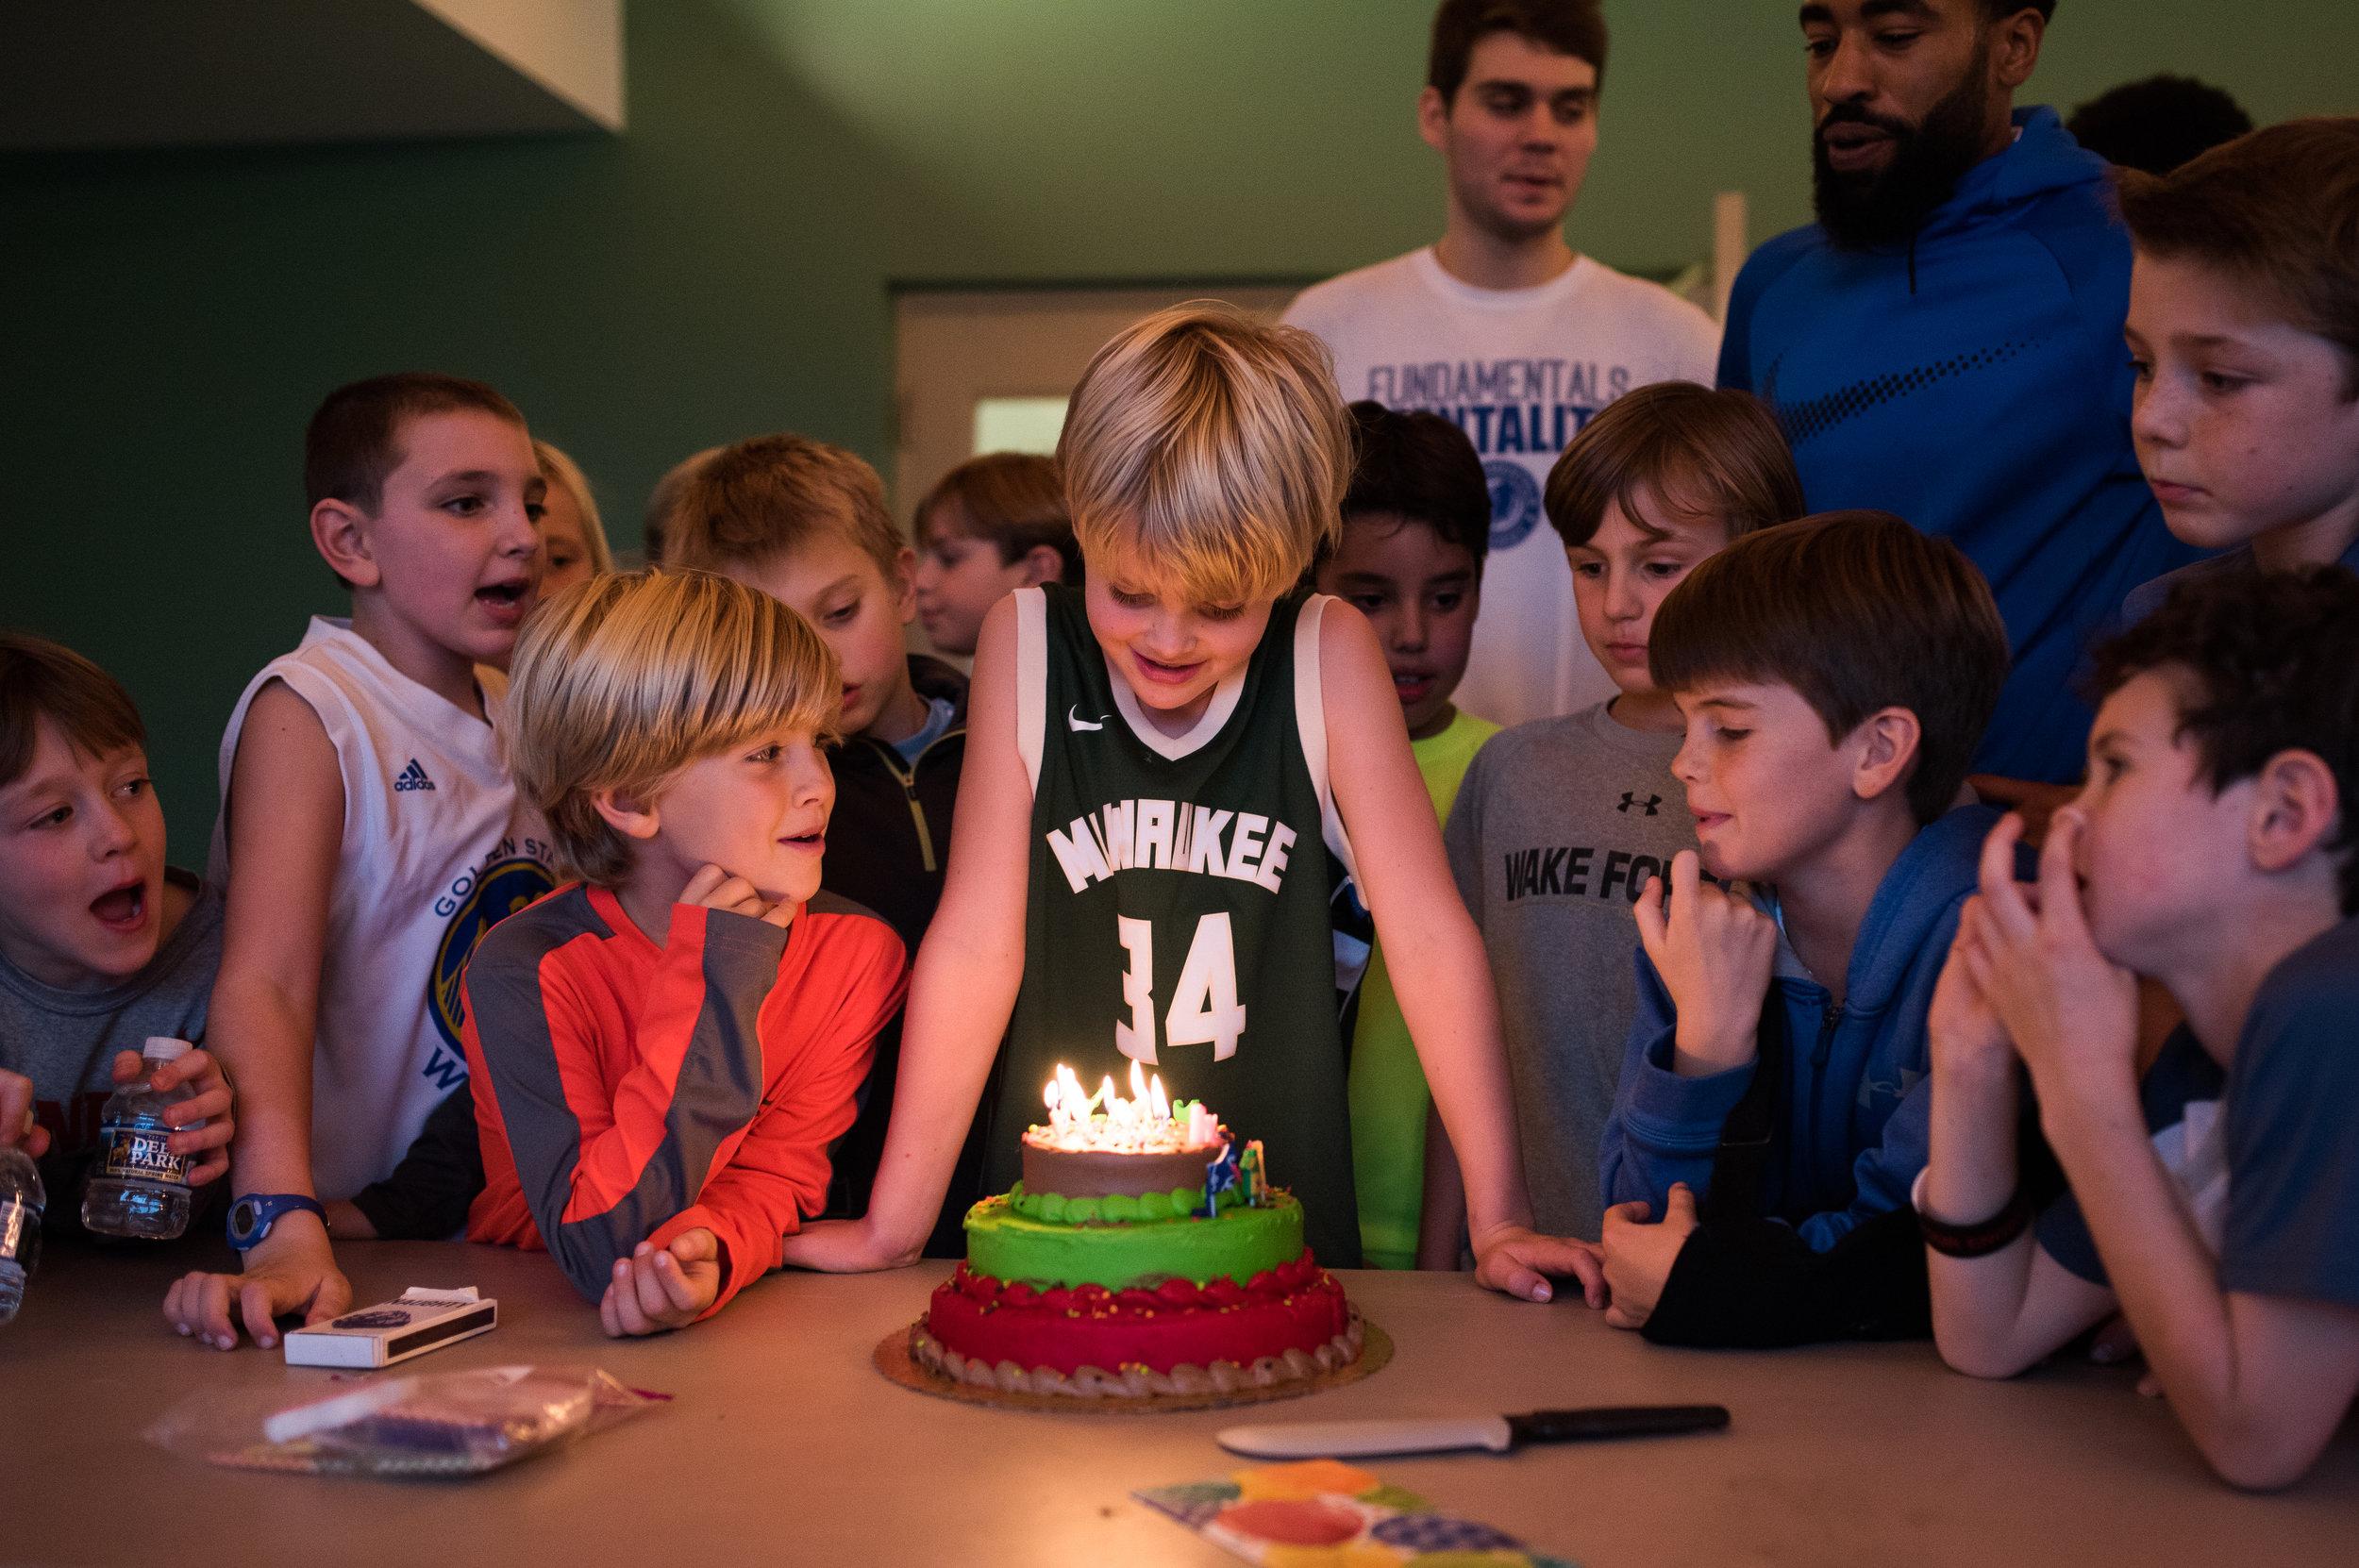 Birthdays - At the Academy